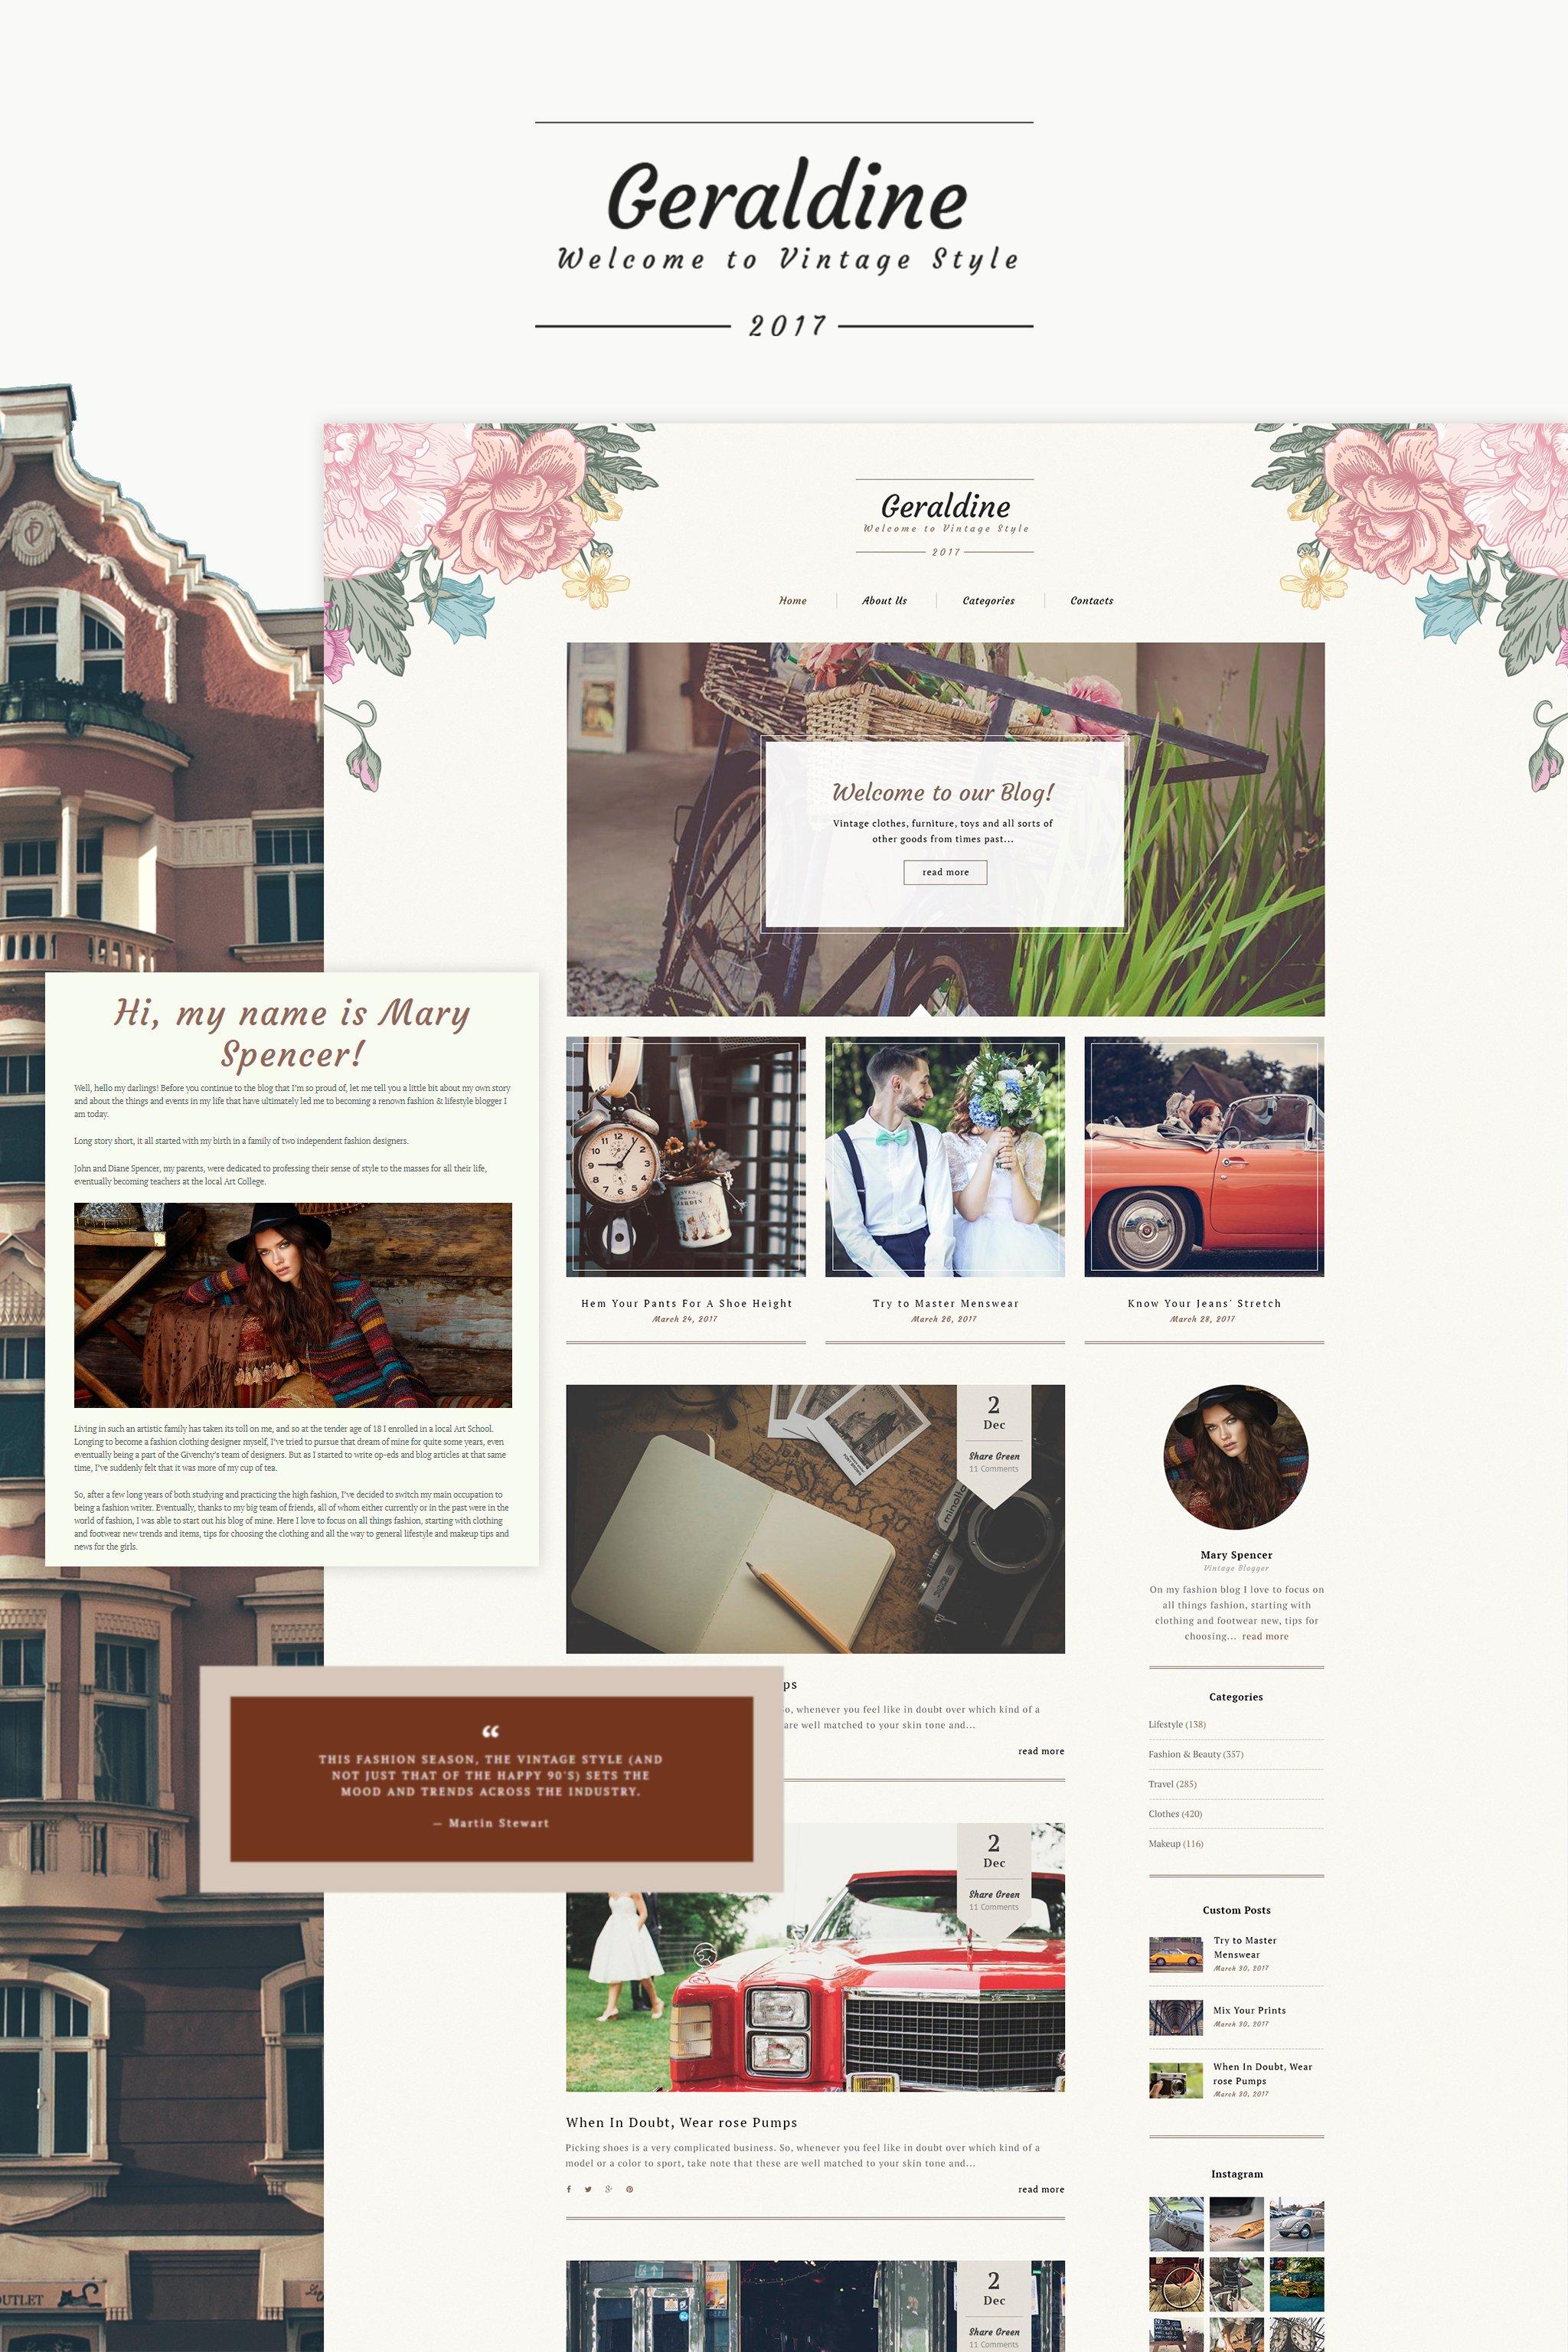 Geraldine - Vintage & Retro Blog №64996